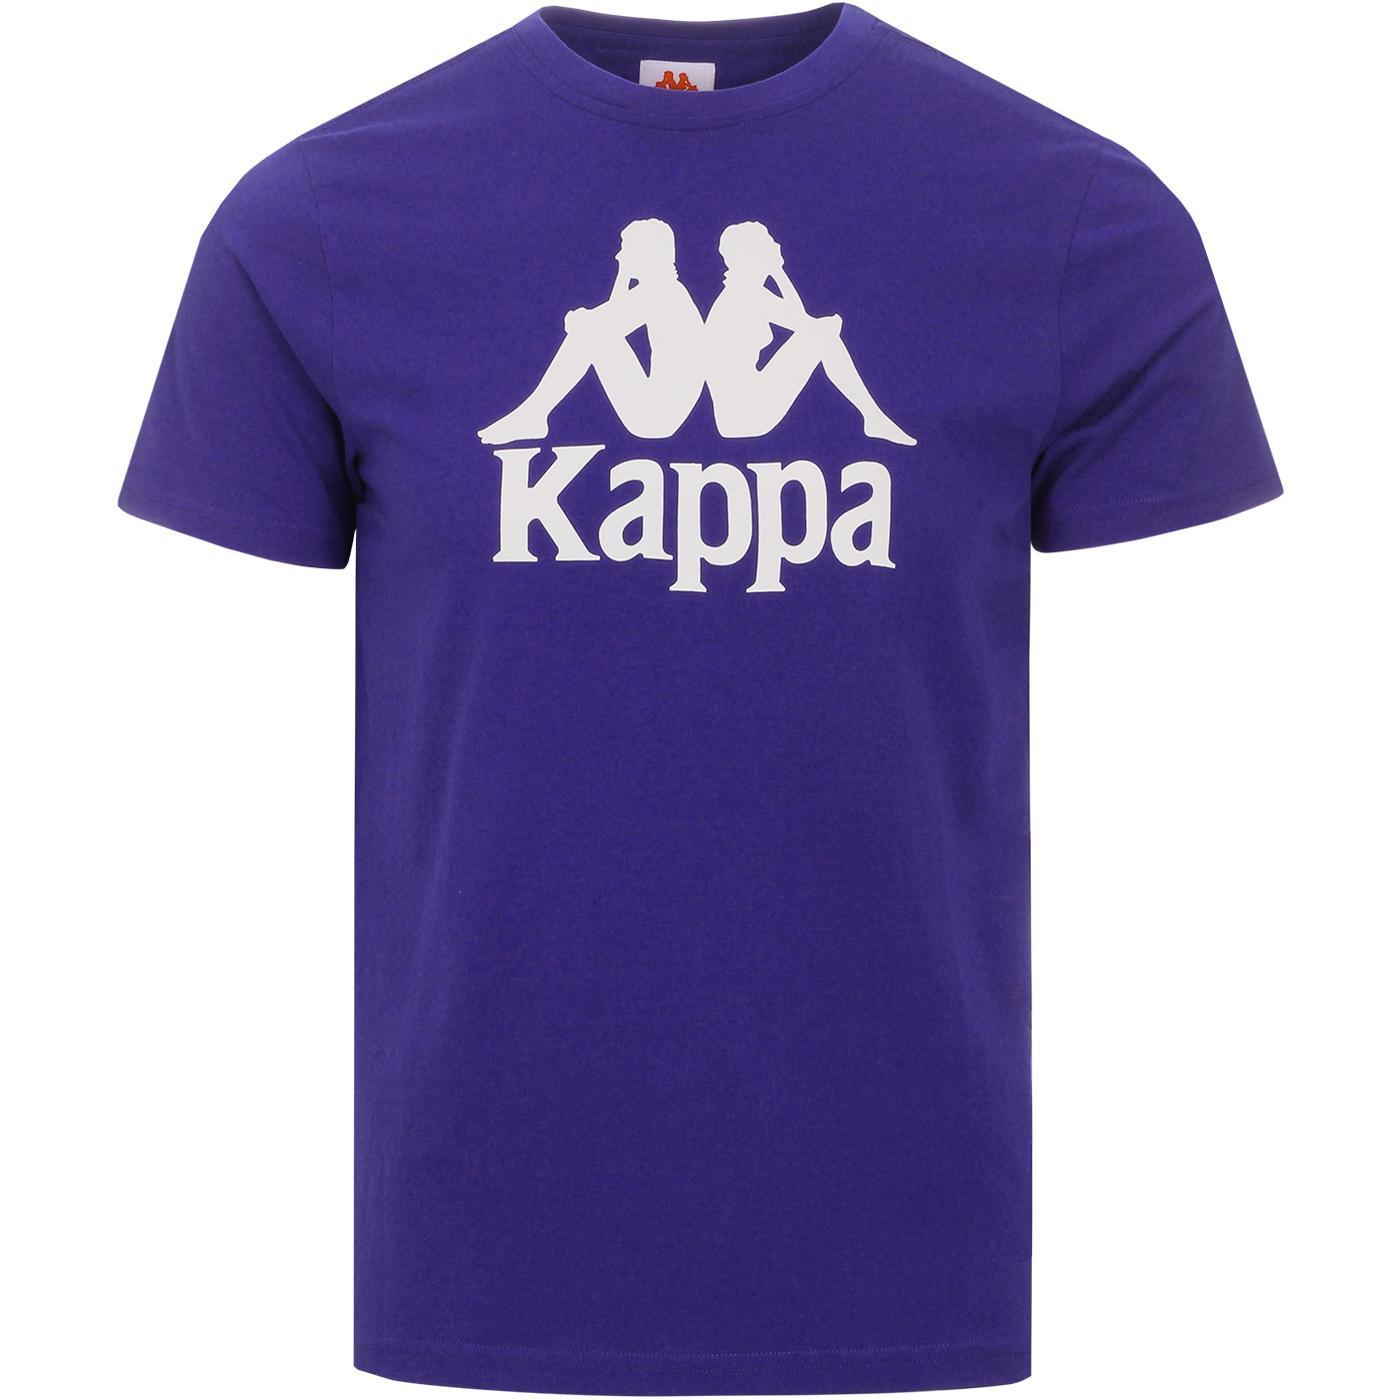 Estessi KAPPA Authentic Graphic Logo T-Shirt BLUE